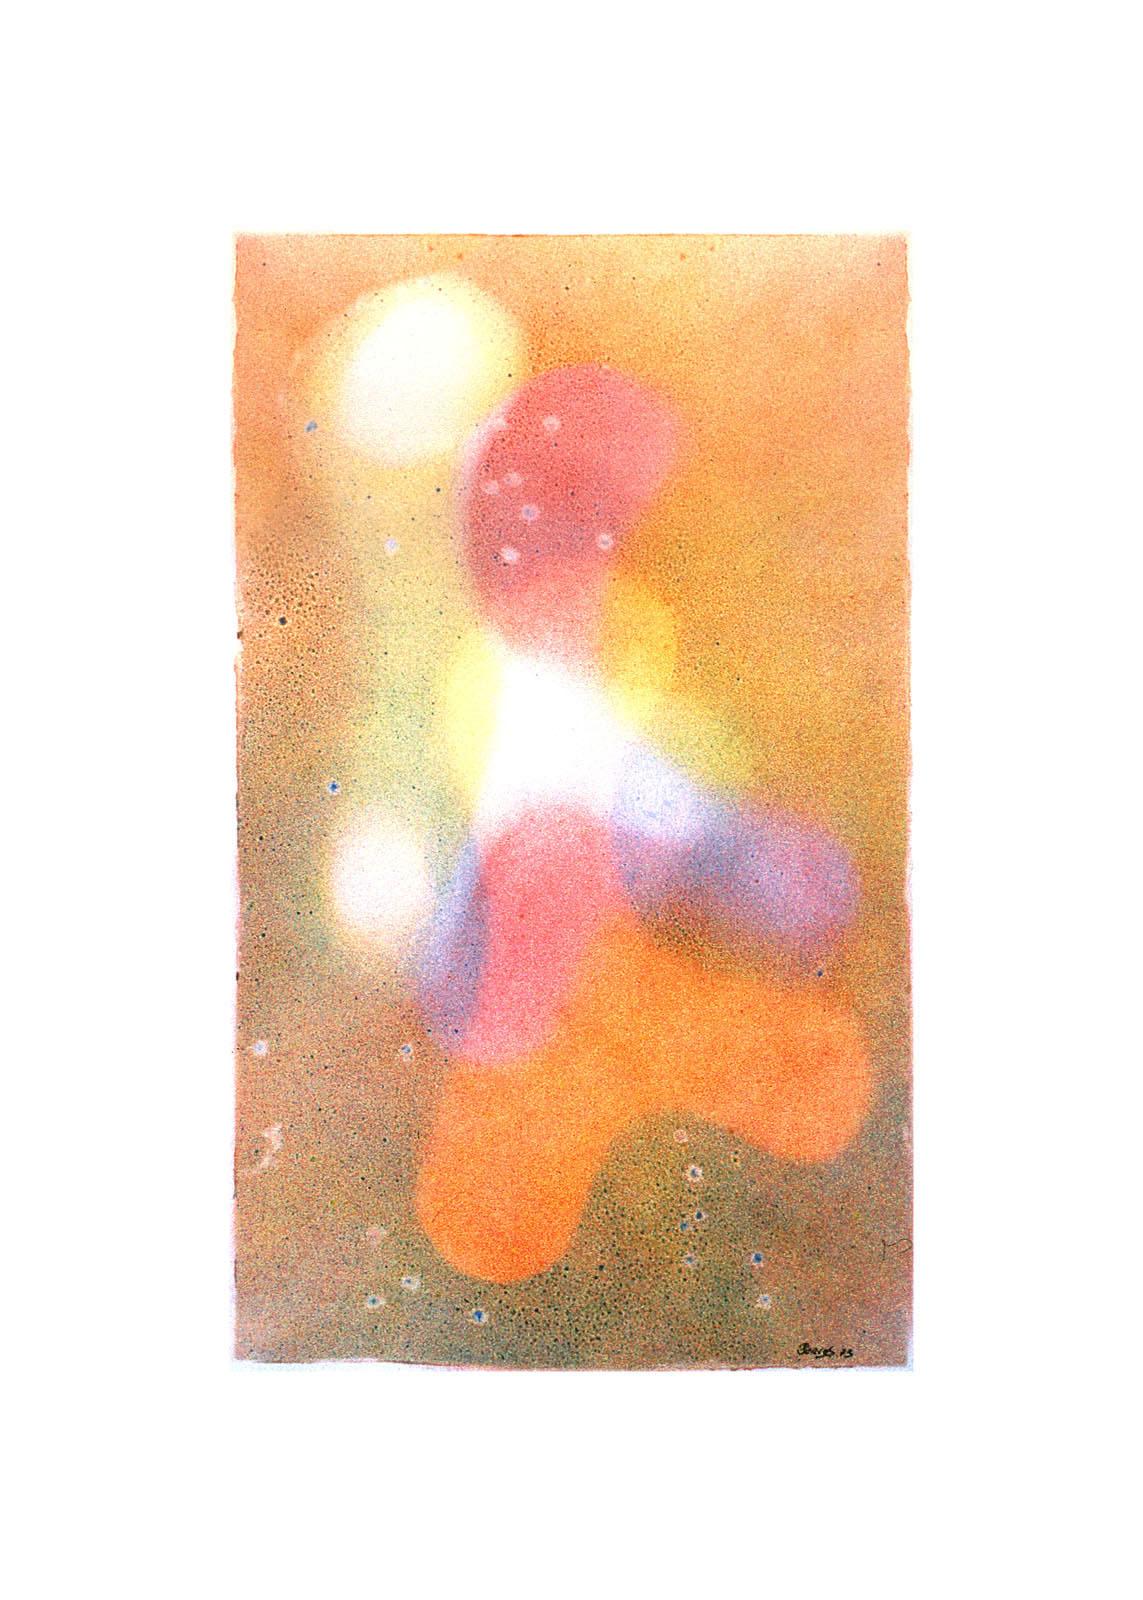 panies-danielvillalobos-spanish-painting-abstract-29